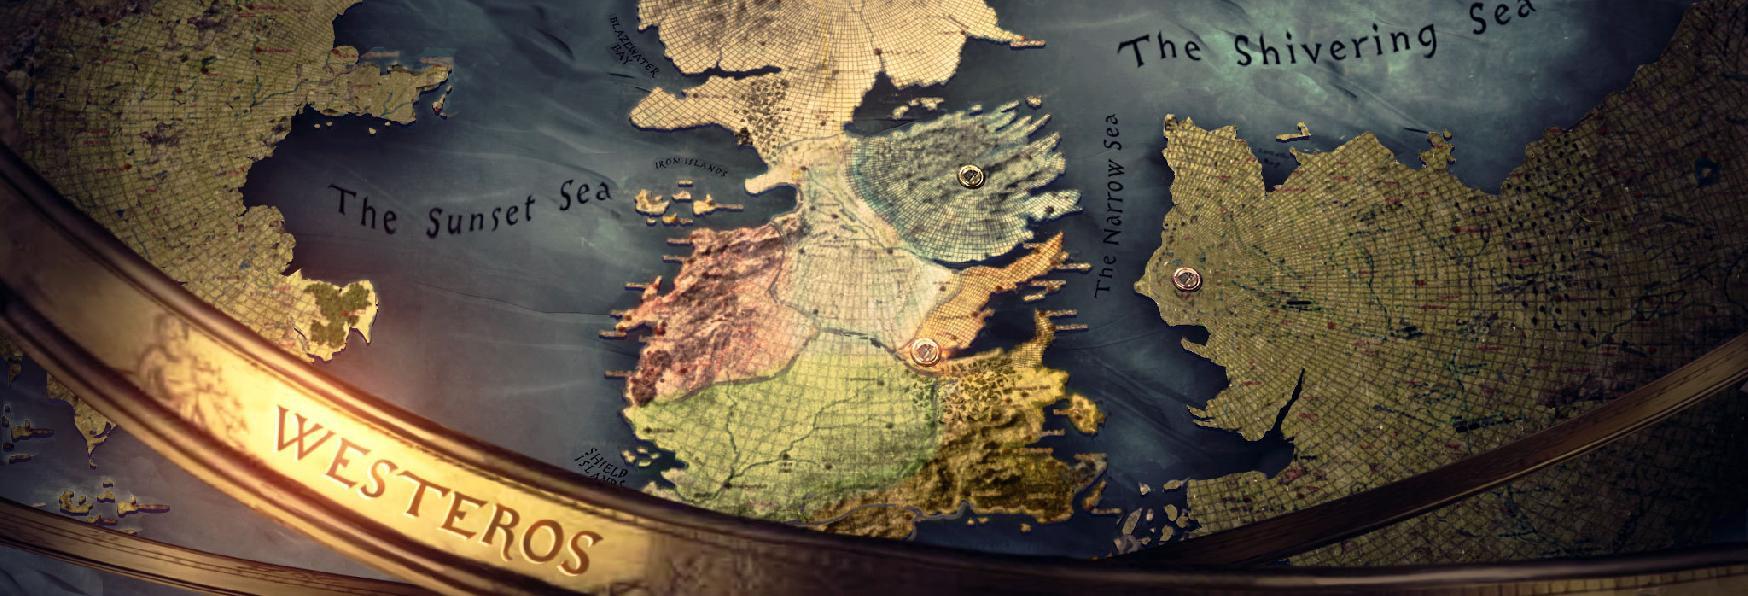 Game of Thrones 8: Cambia la Sigla Inziale, ecco un'Anteprima e le Ipotesi al riguardo